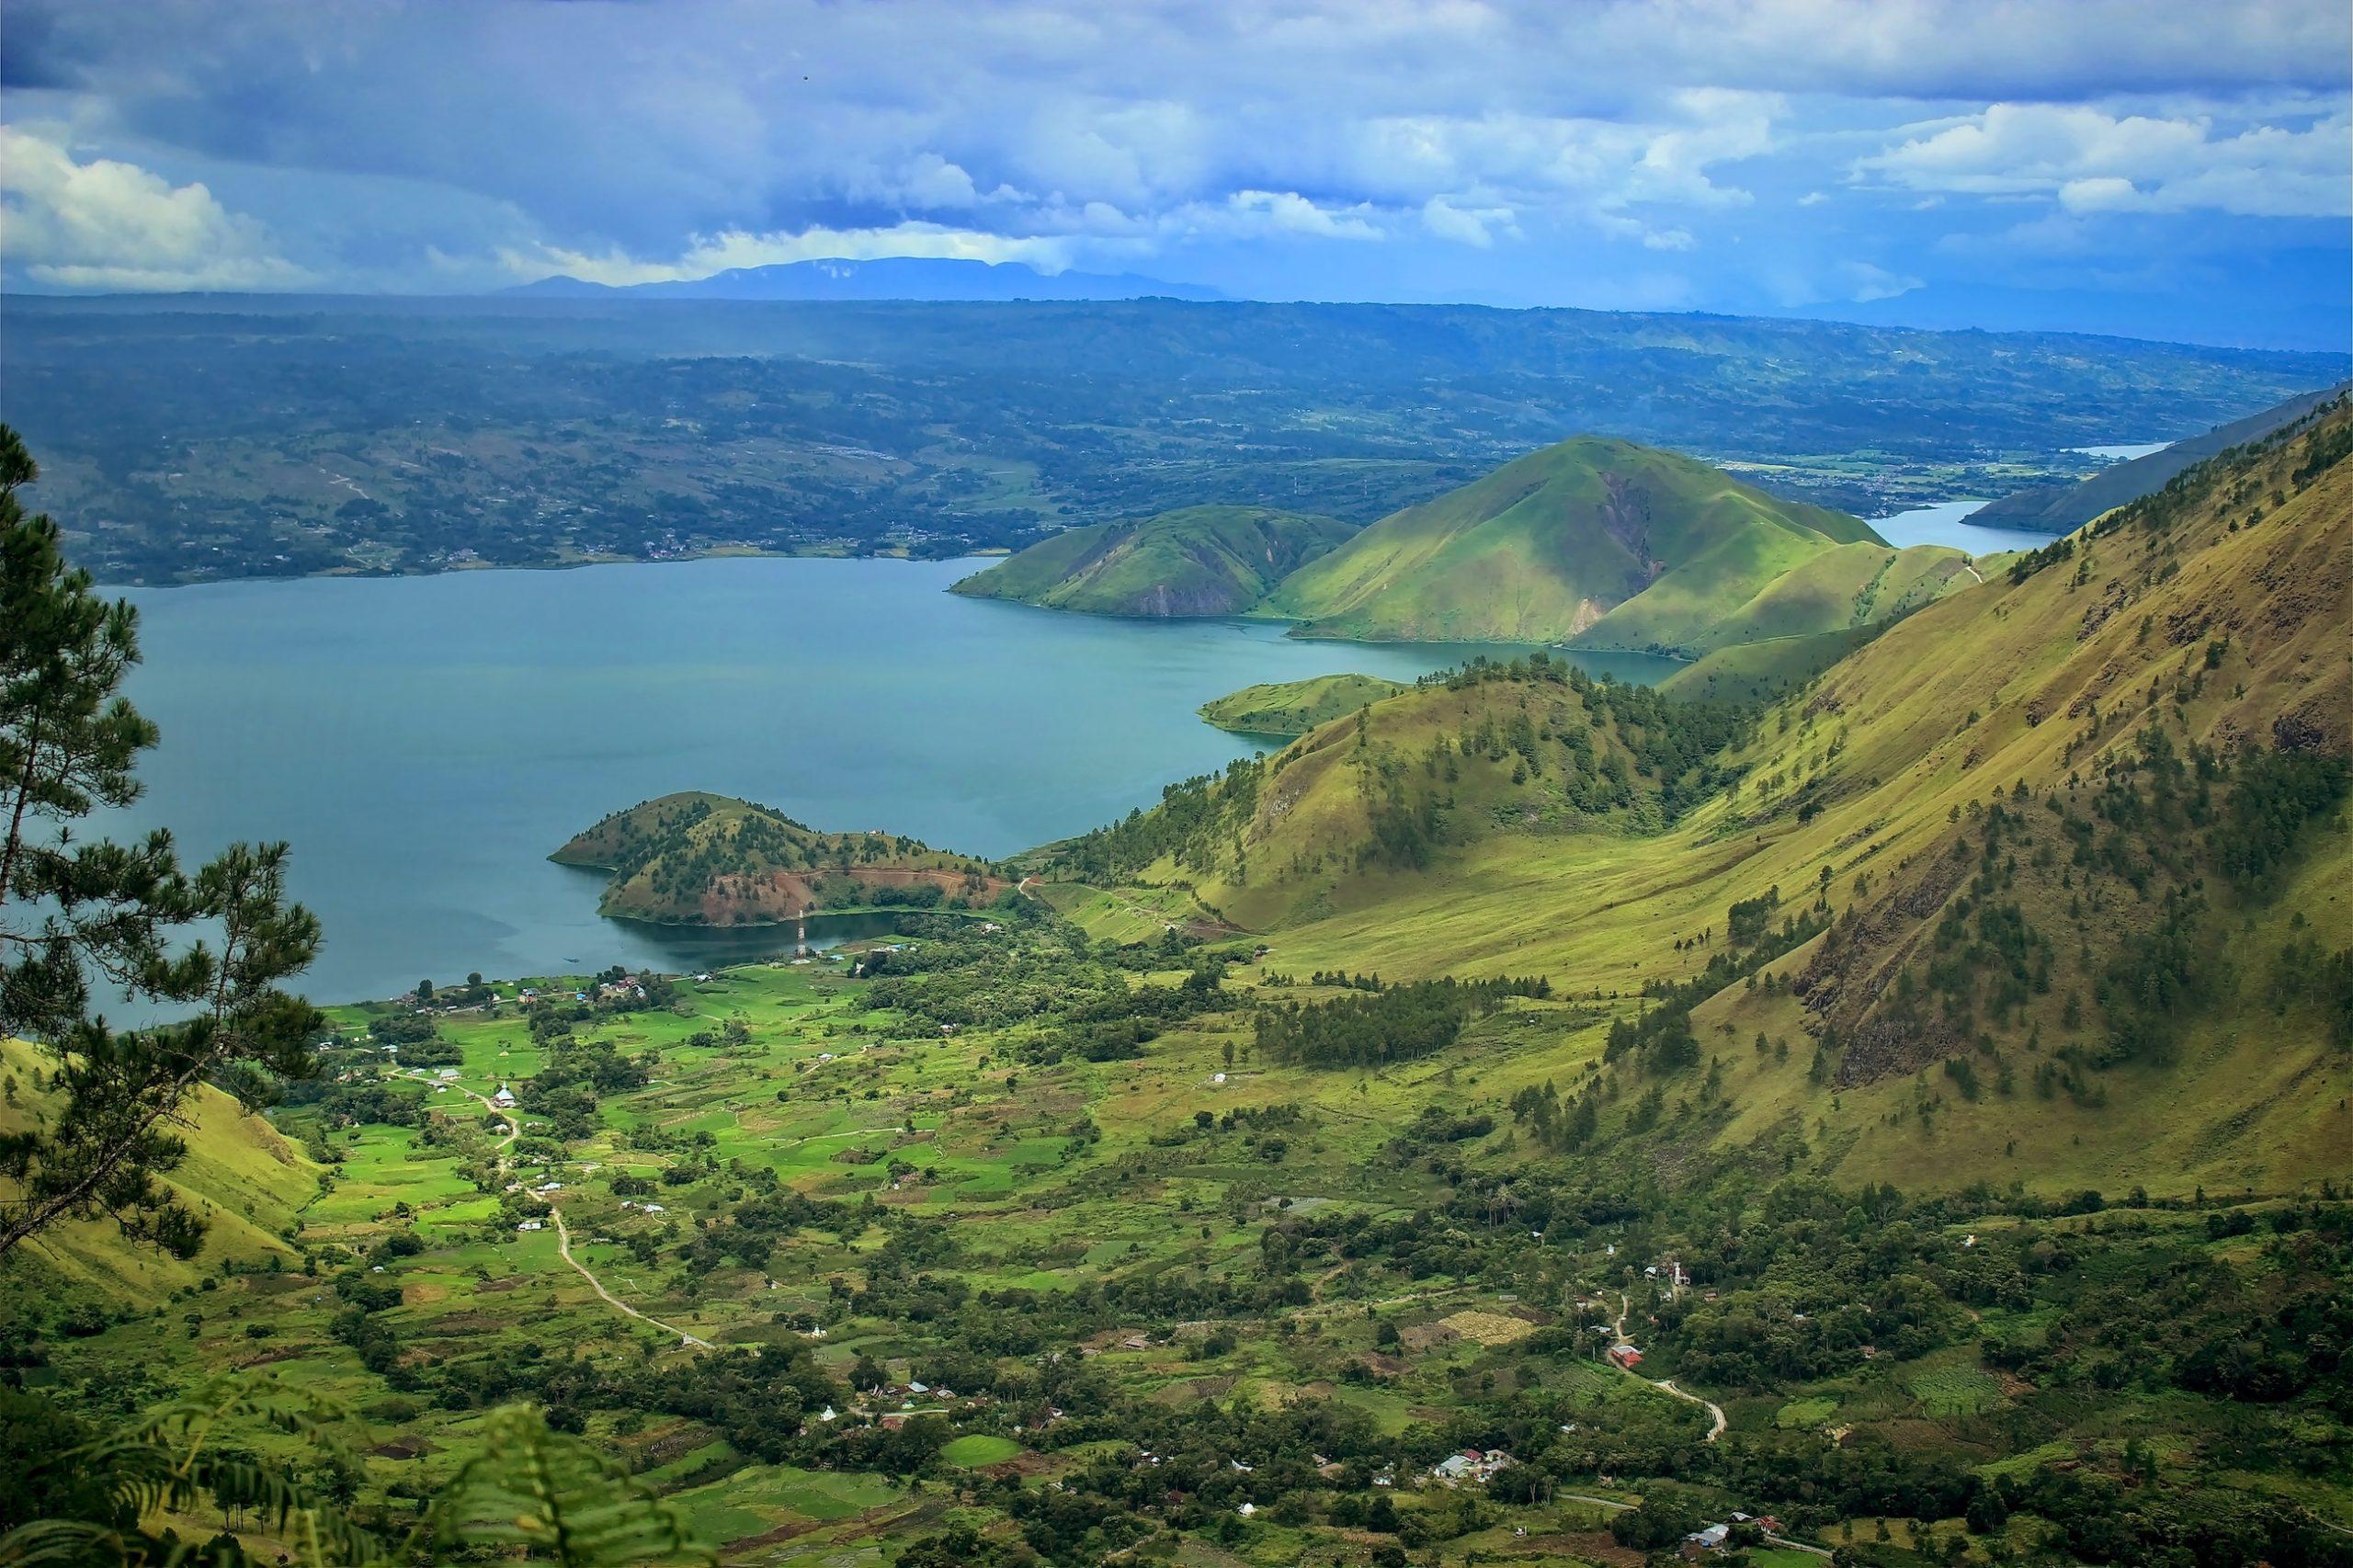 Gunung Purba Toba ledakannya menyimpan sejuta misteri